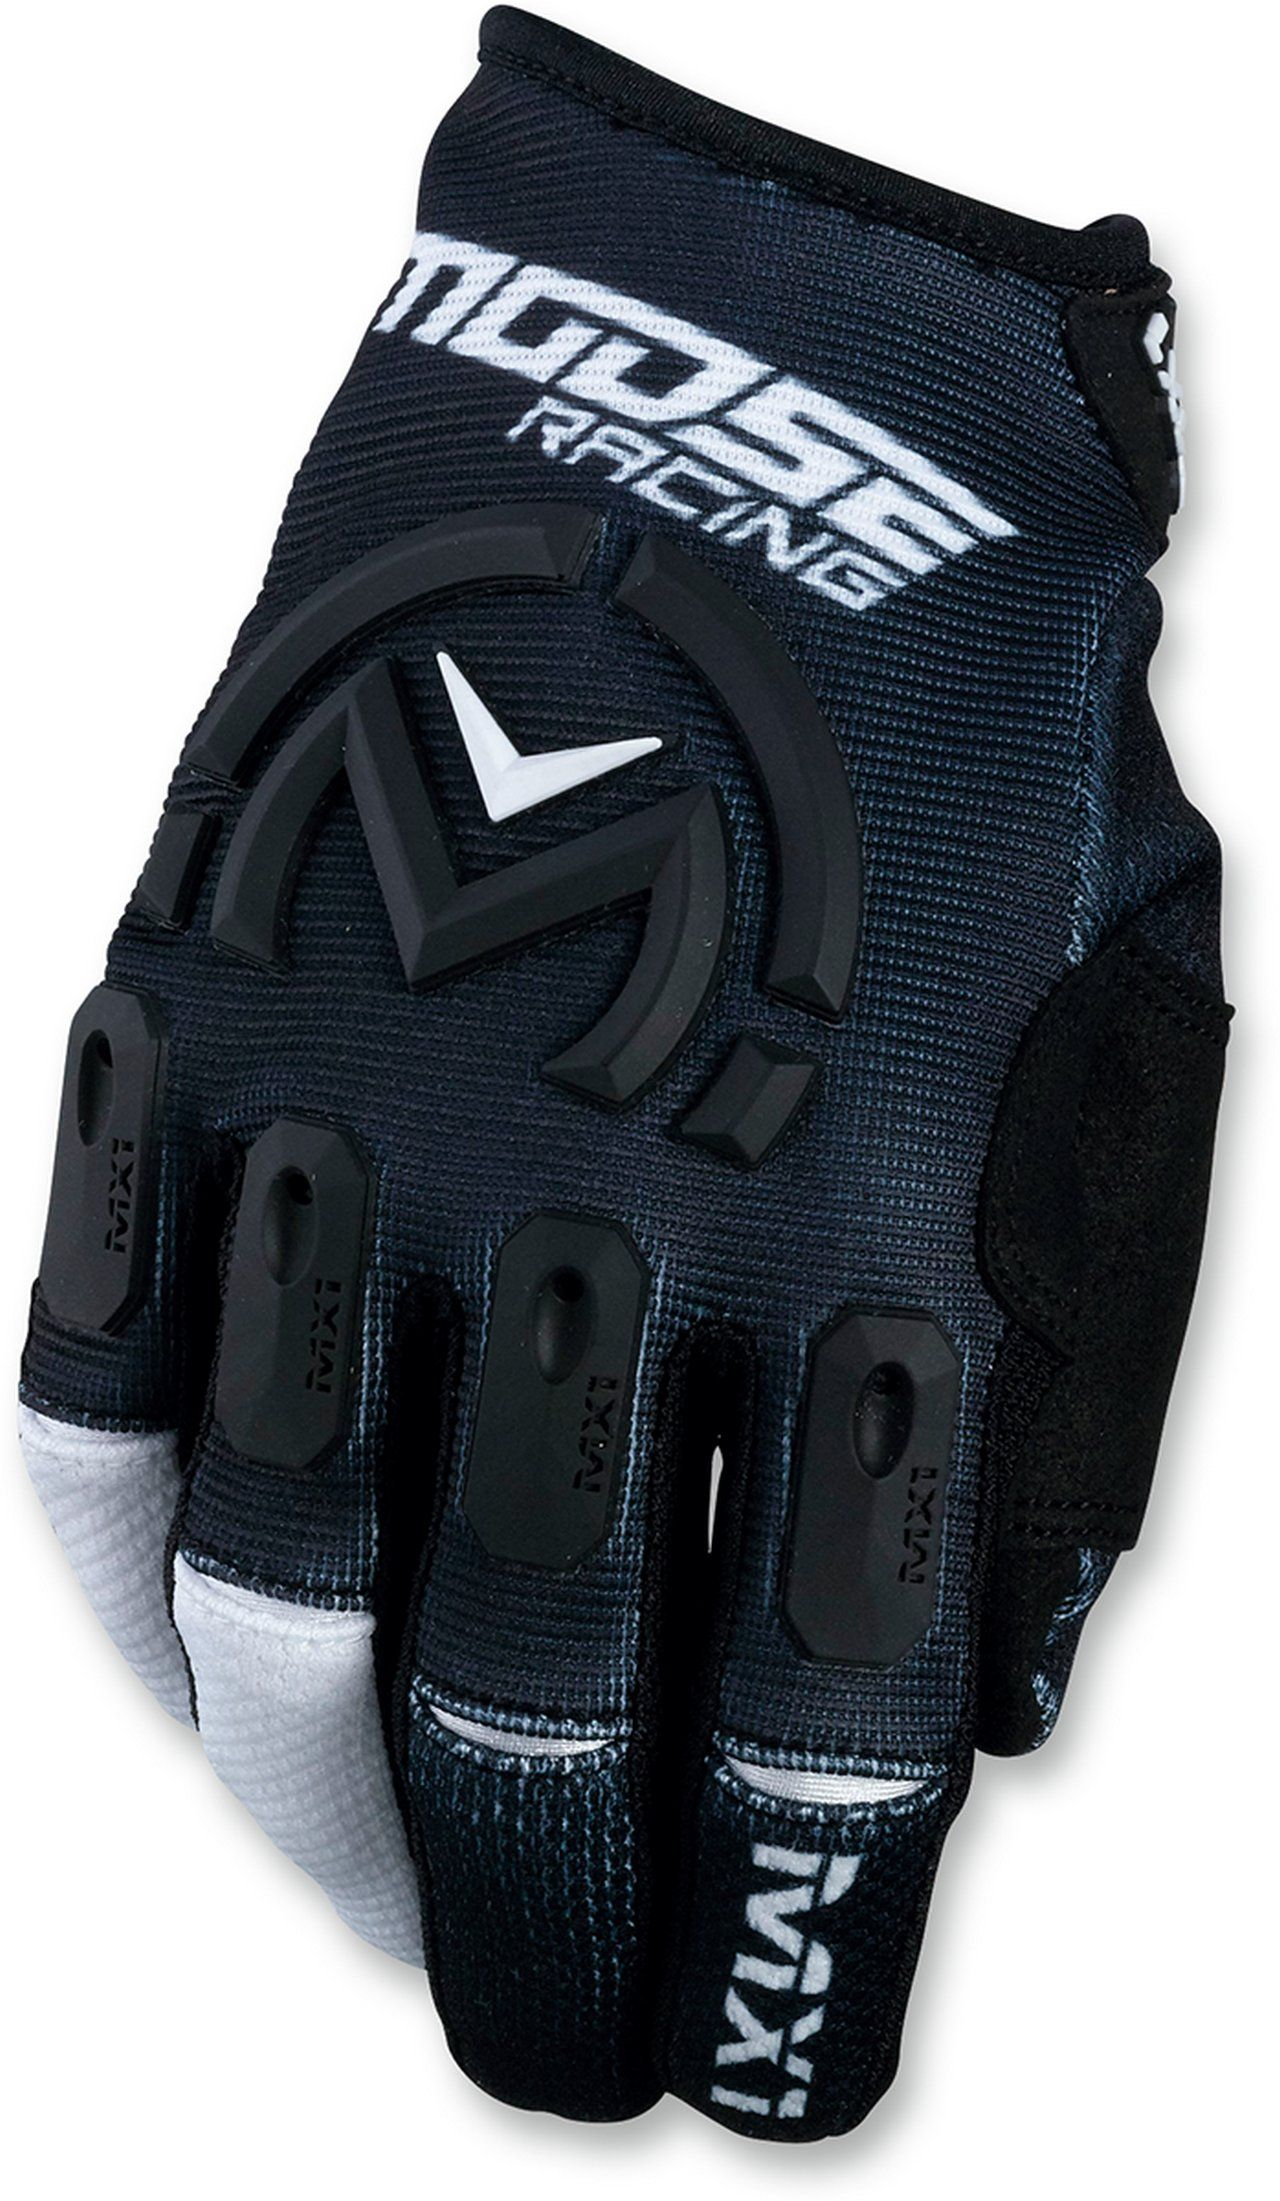 【MOOSE RACING】MX1 手套 [3330-4482] - 「Webike-摩托百貨」